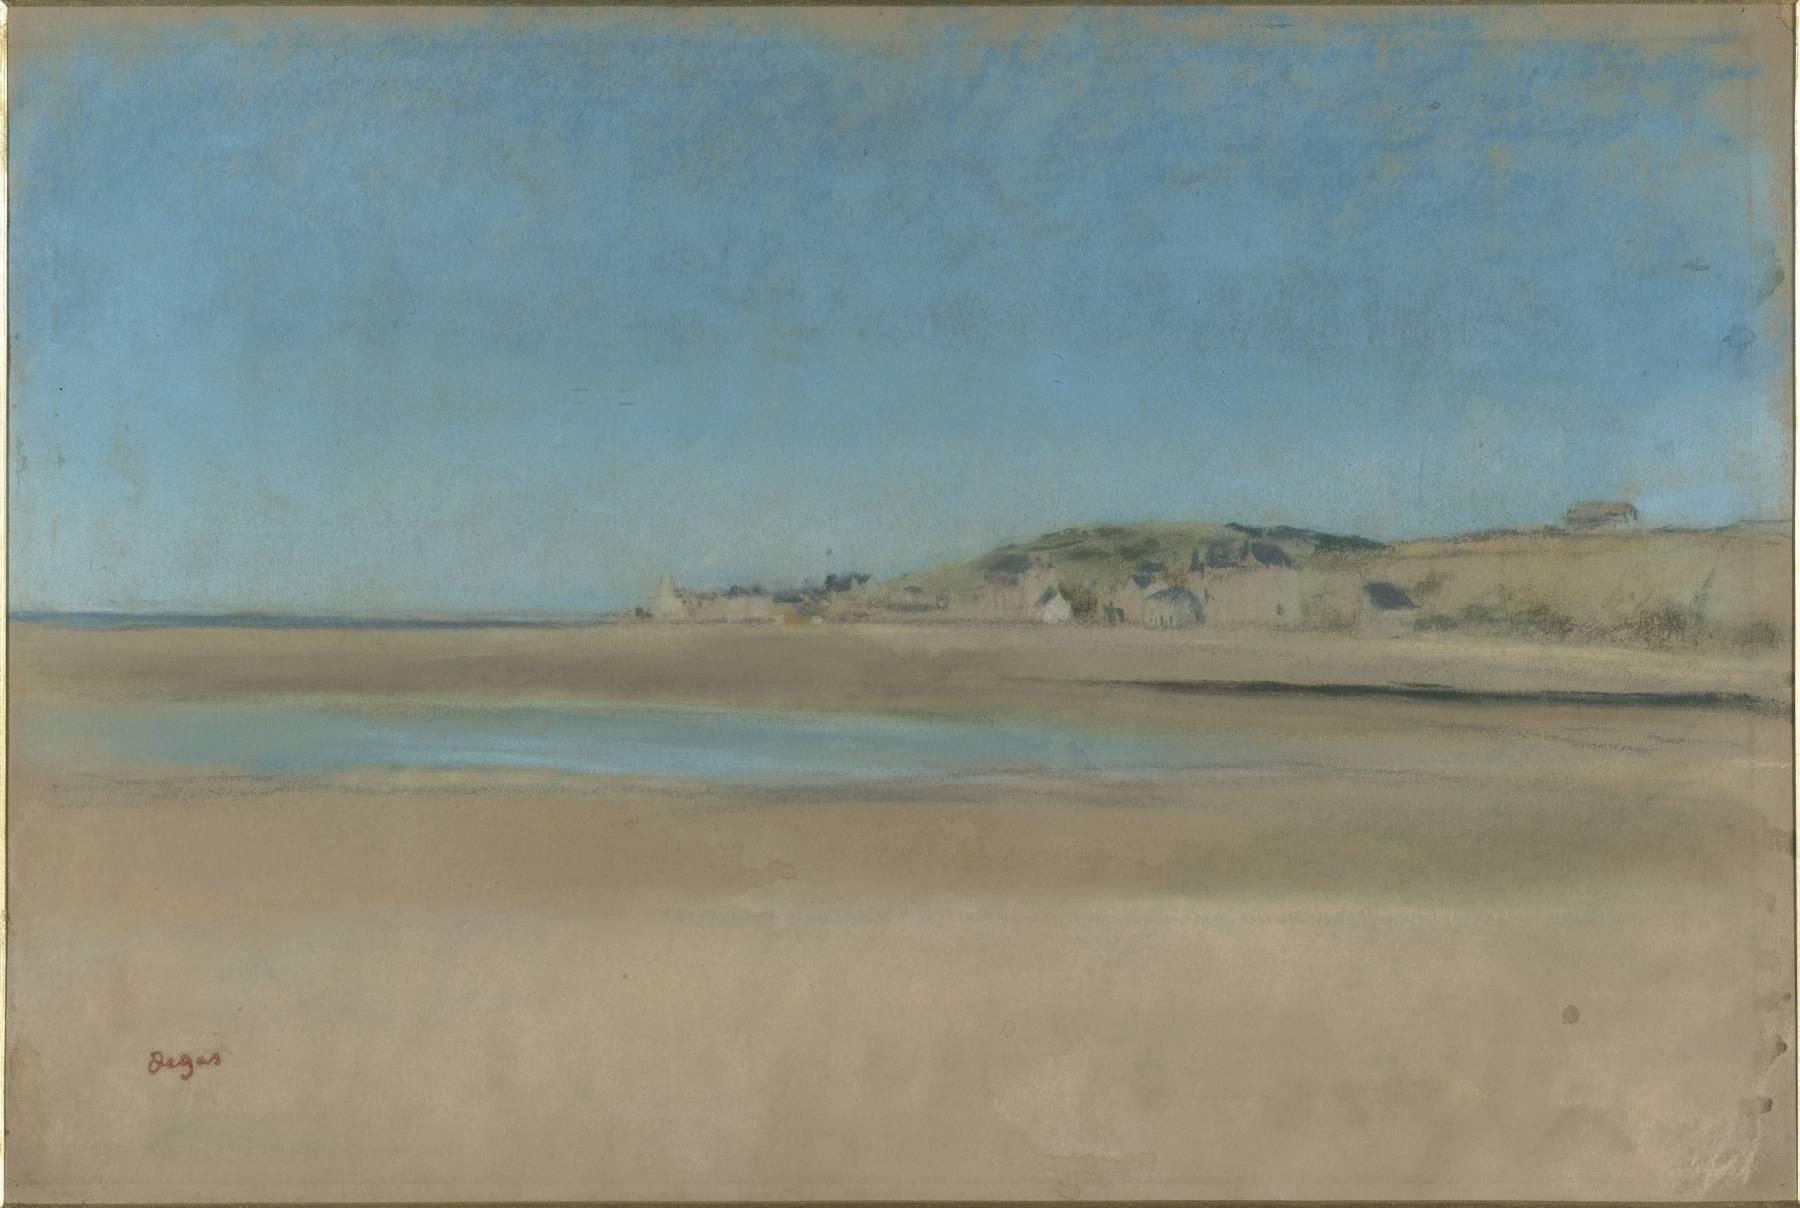 Edgar Degas, Maisons au bord de la mer